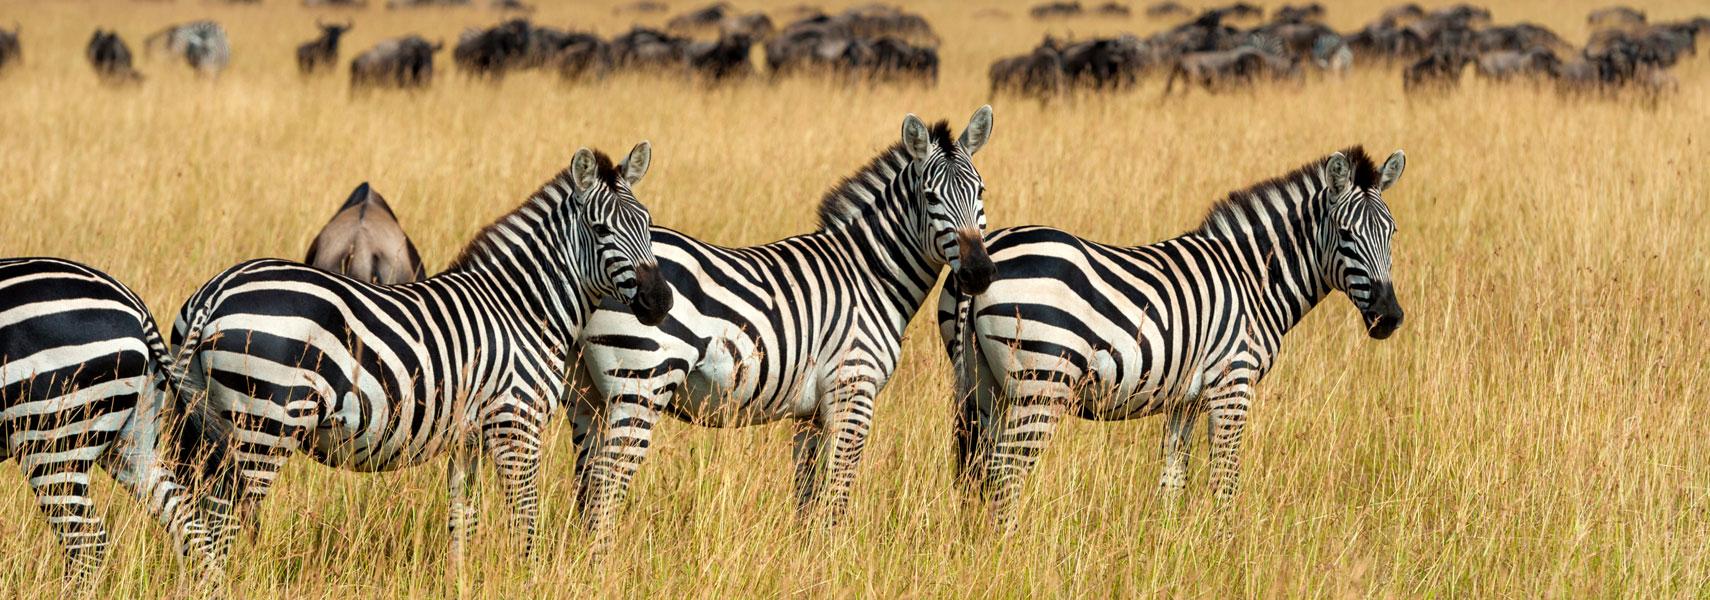 amboseli-national-park-zebra